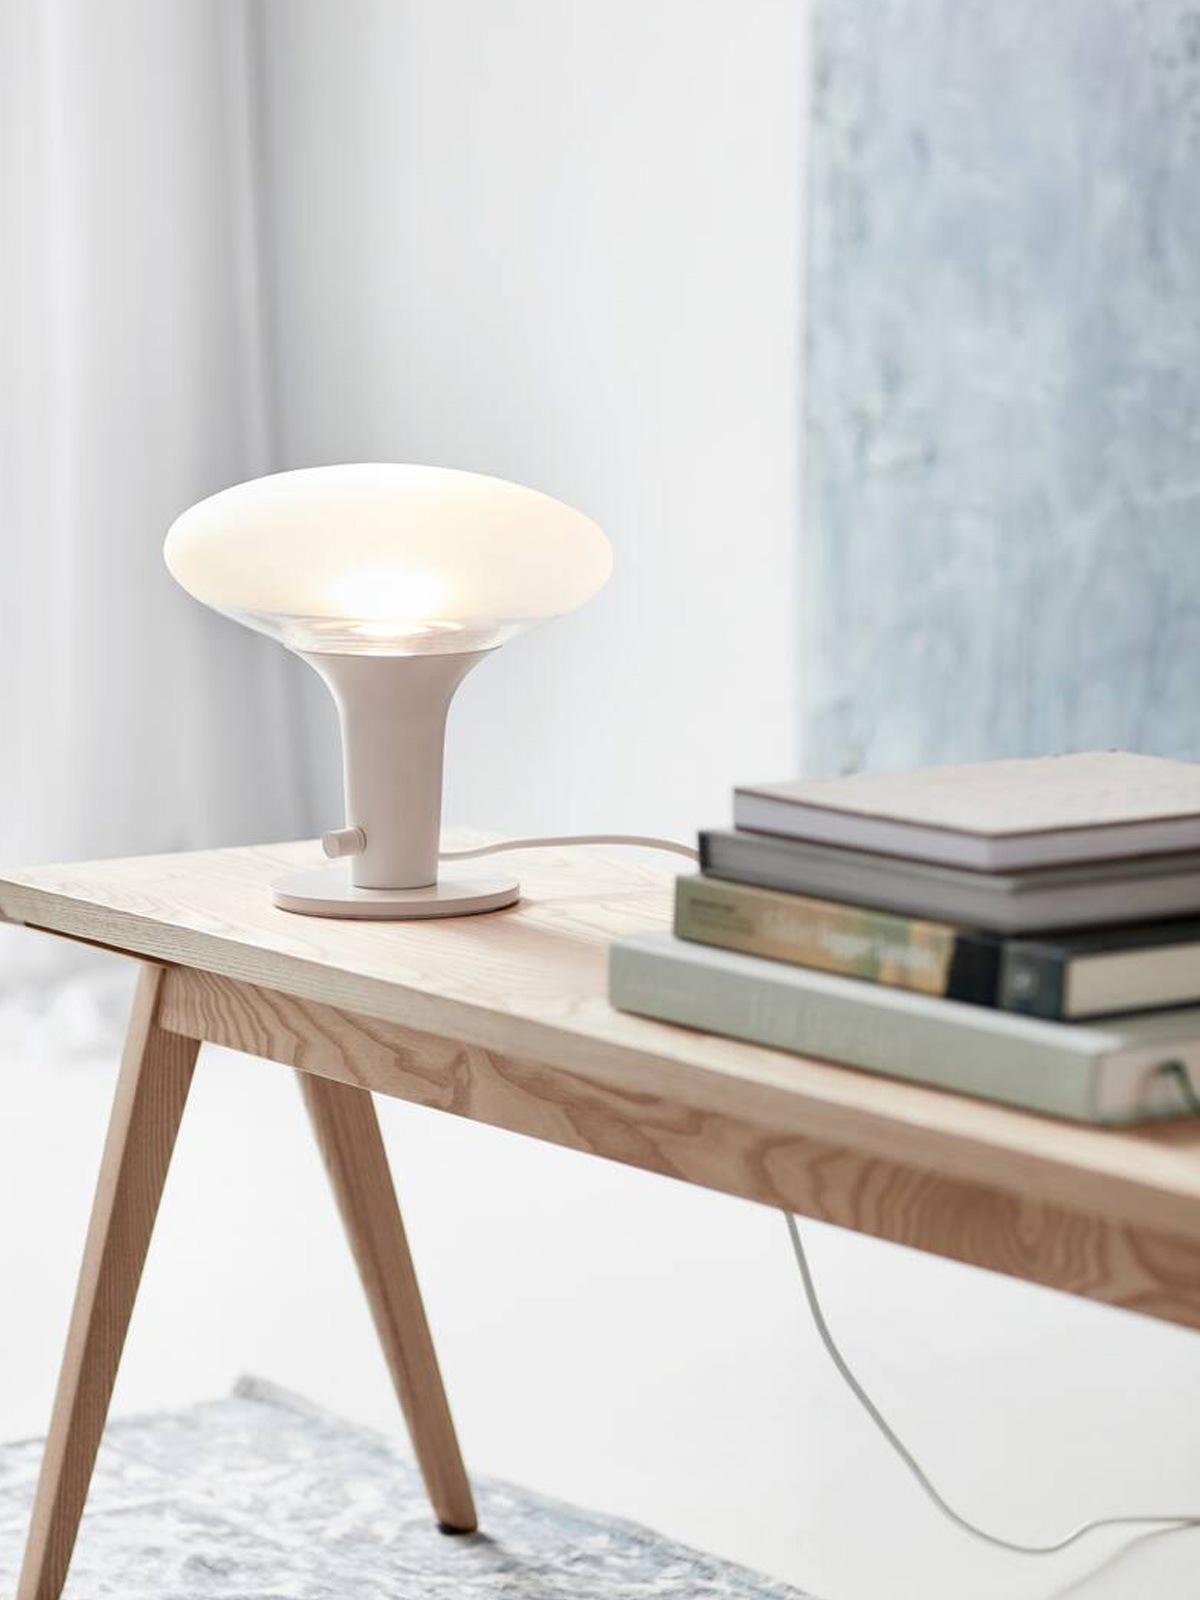 Nordlux Dee 2.0 Table Design for the People DesignOrt Onlineshop